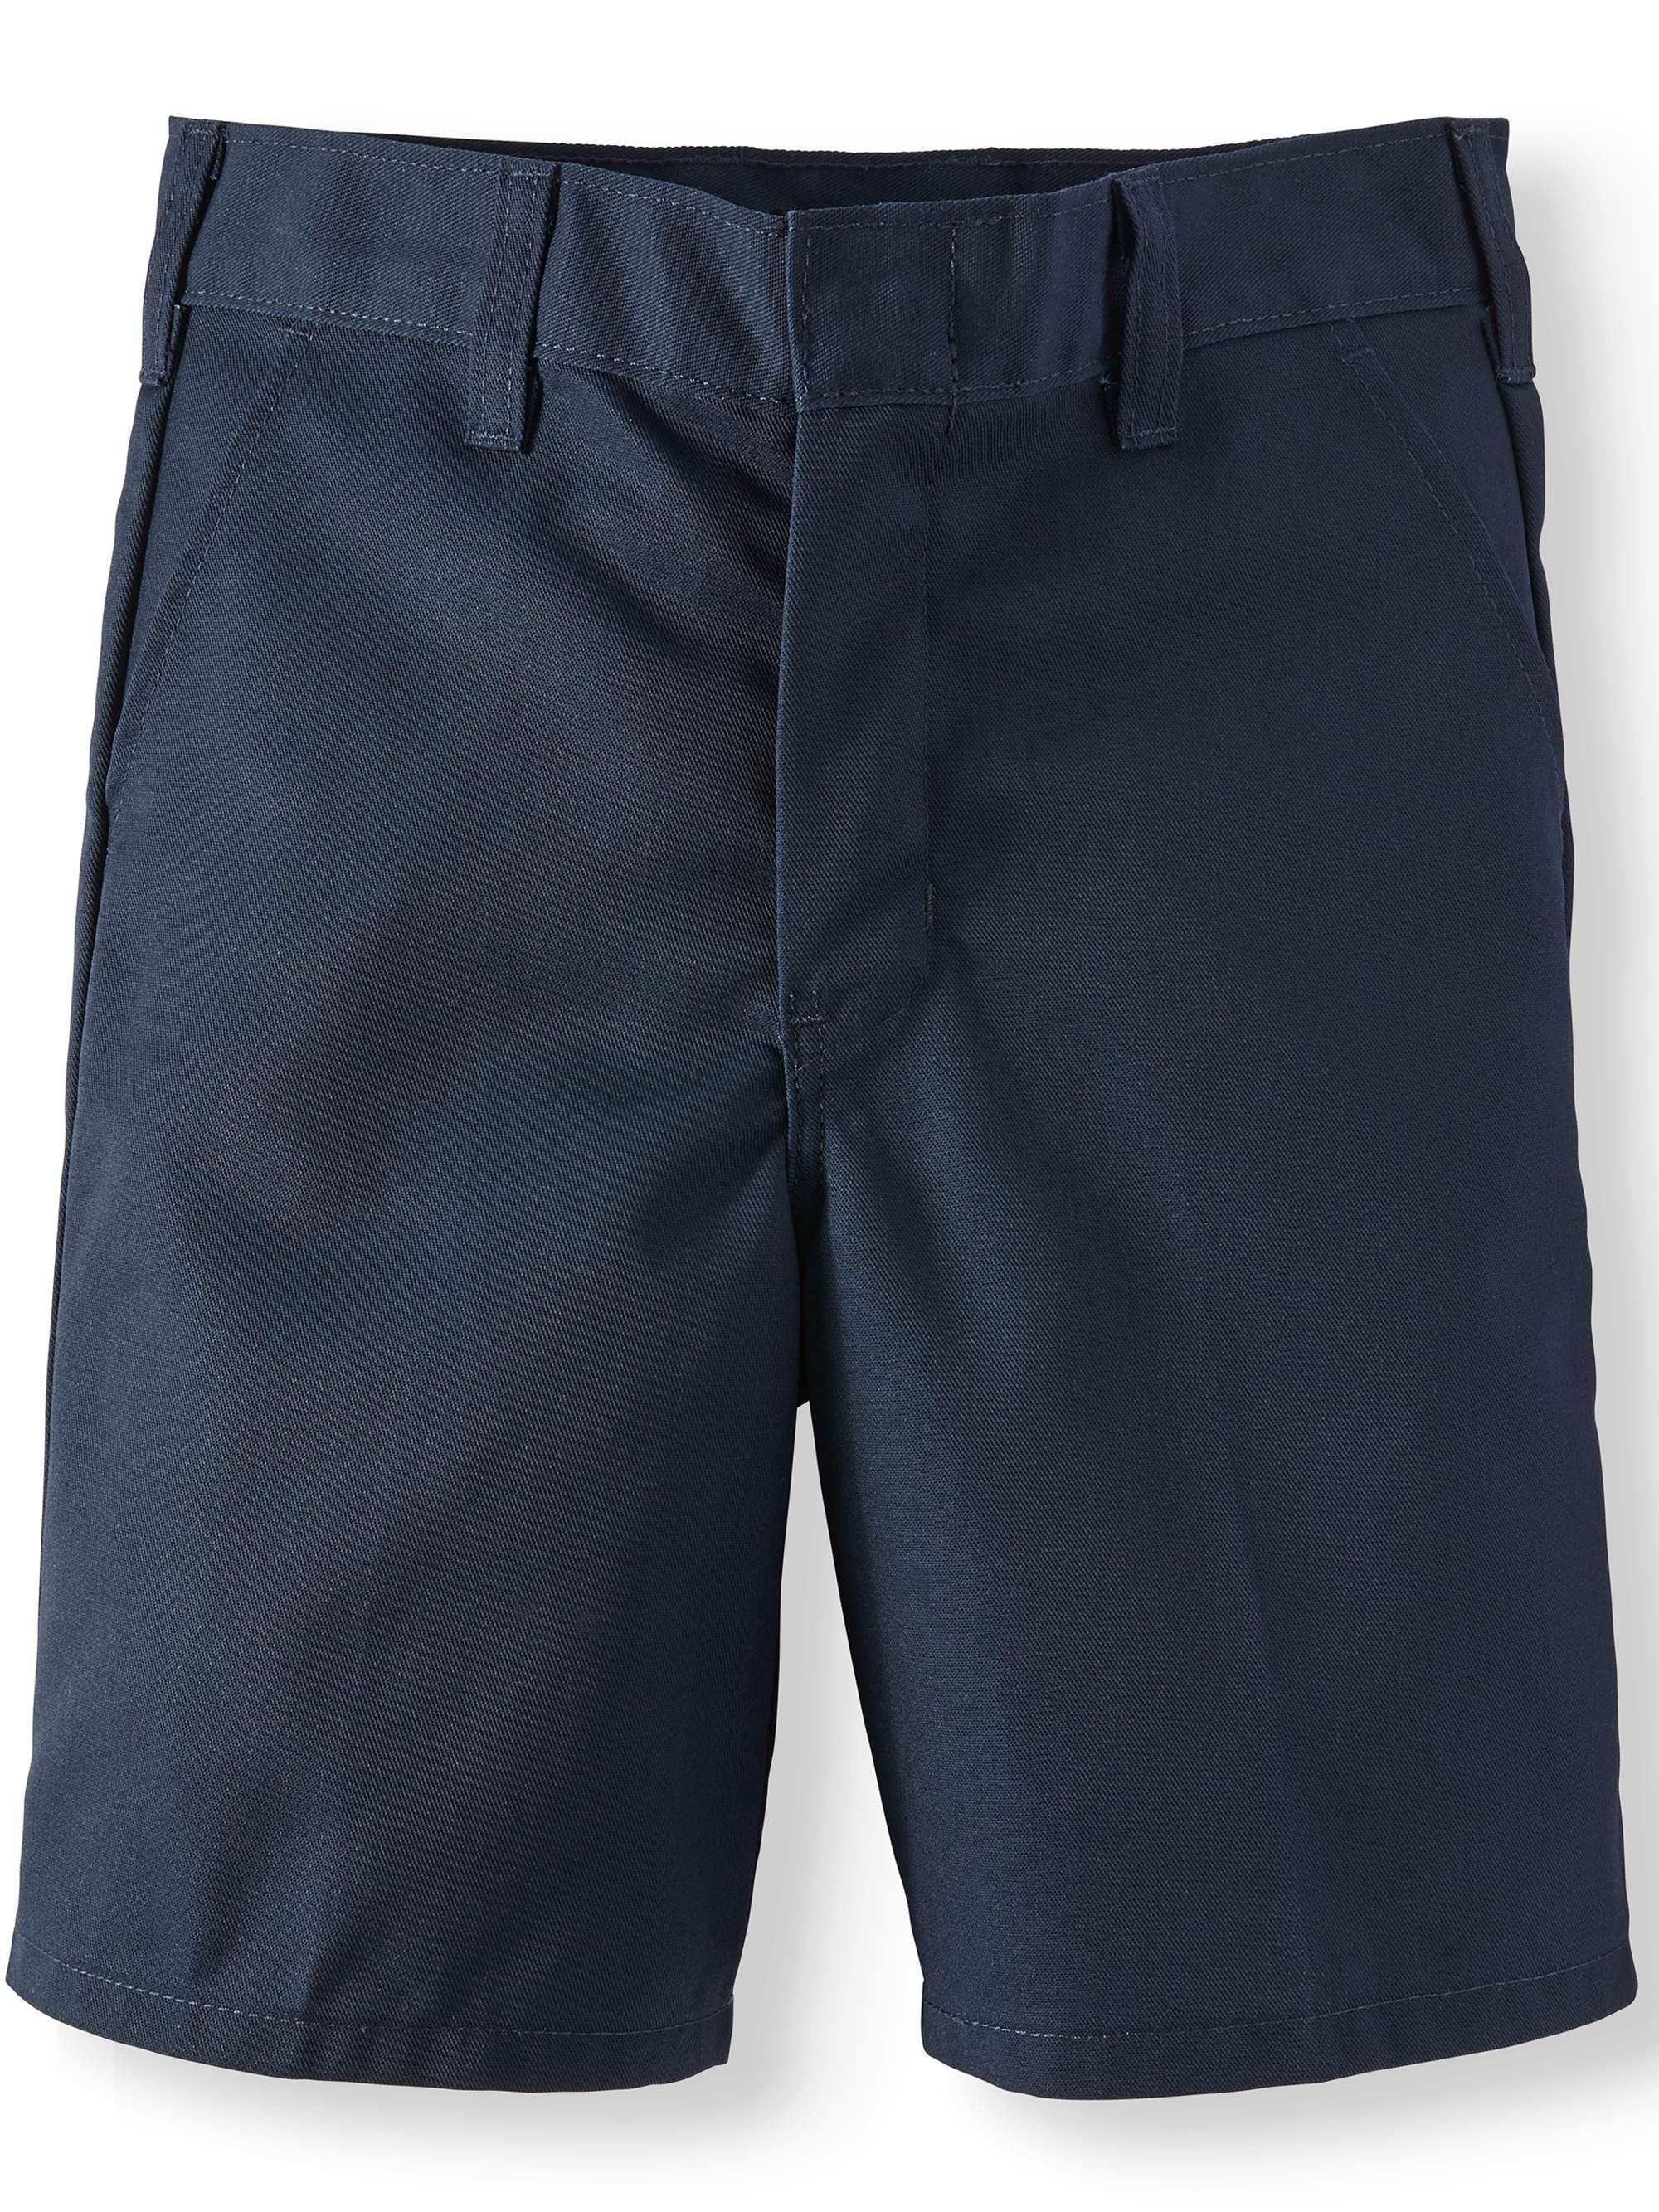 Boy's Traditional School Uniform Style Shorts